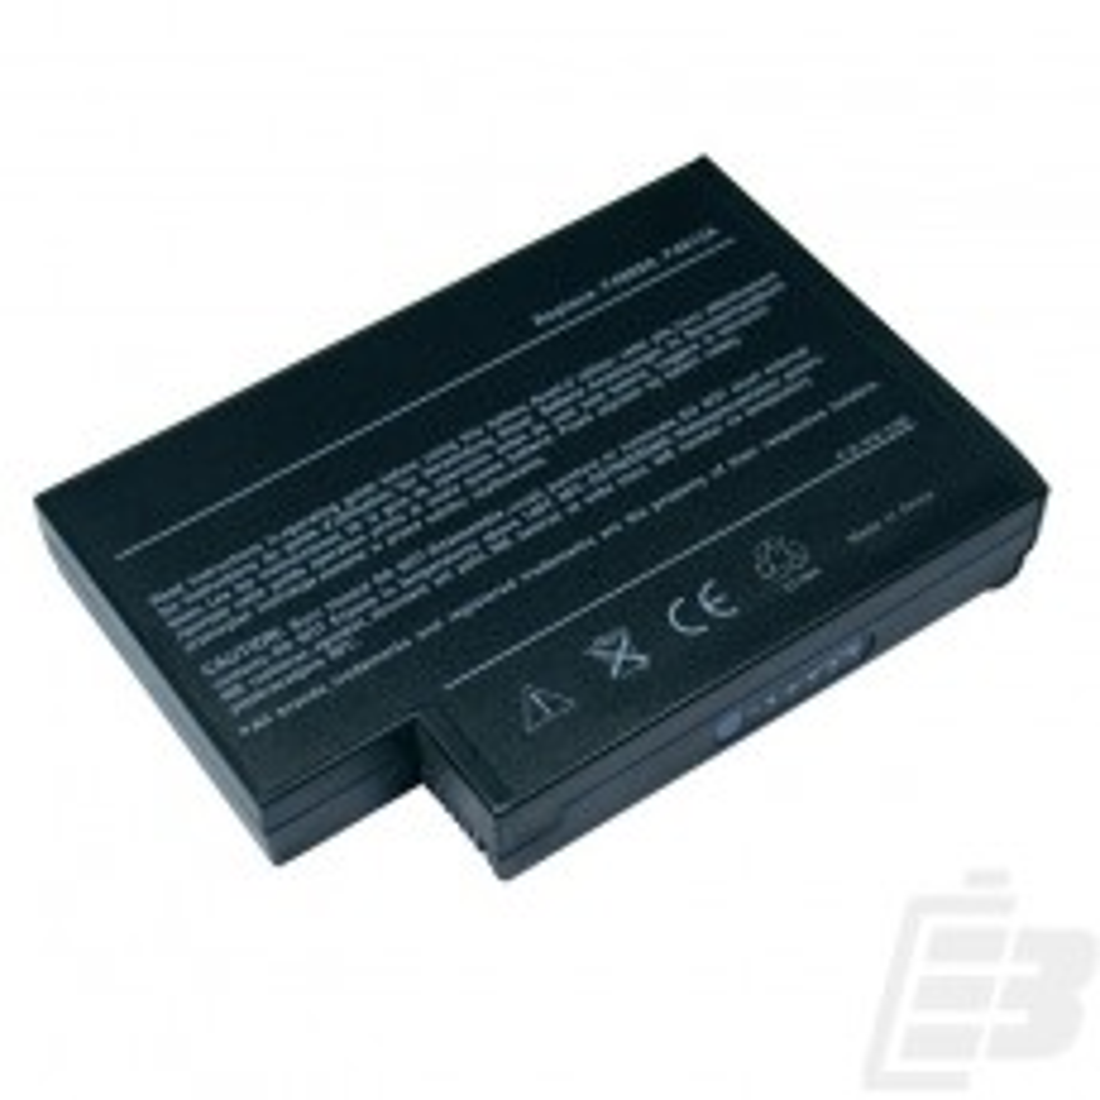 Laptop battery Compaq Presario 2100